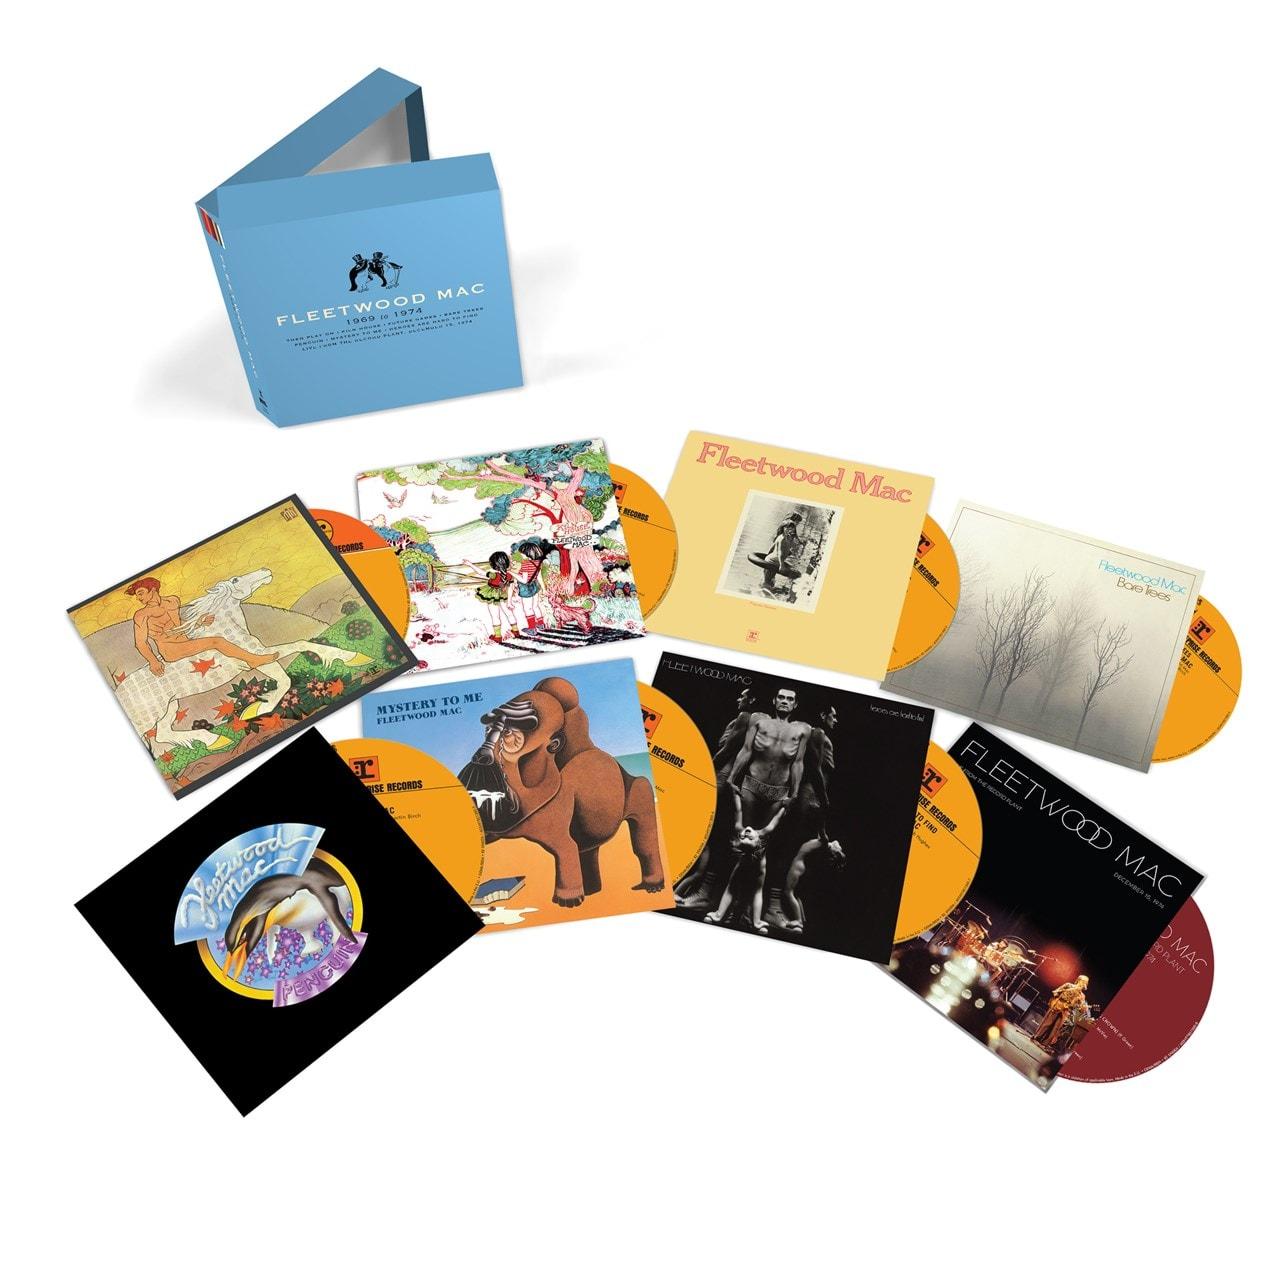 Fleetwood Mac 1969 to 1974 - 2